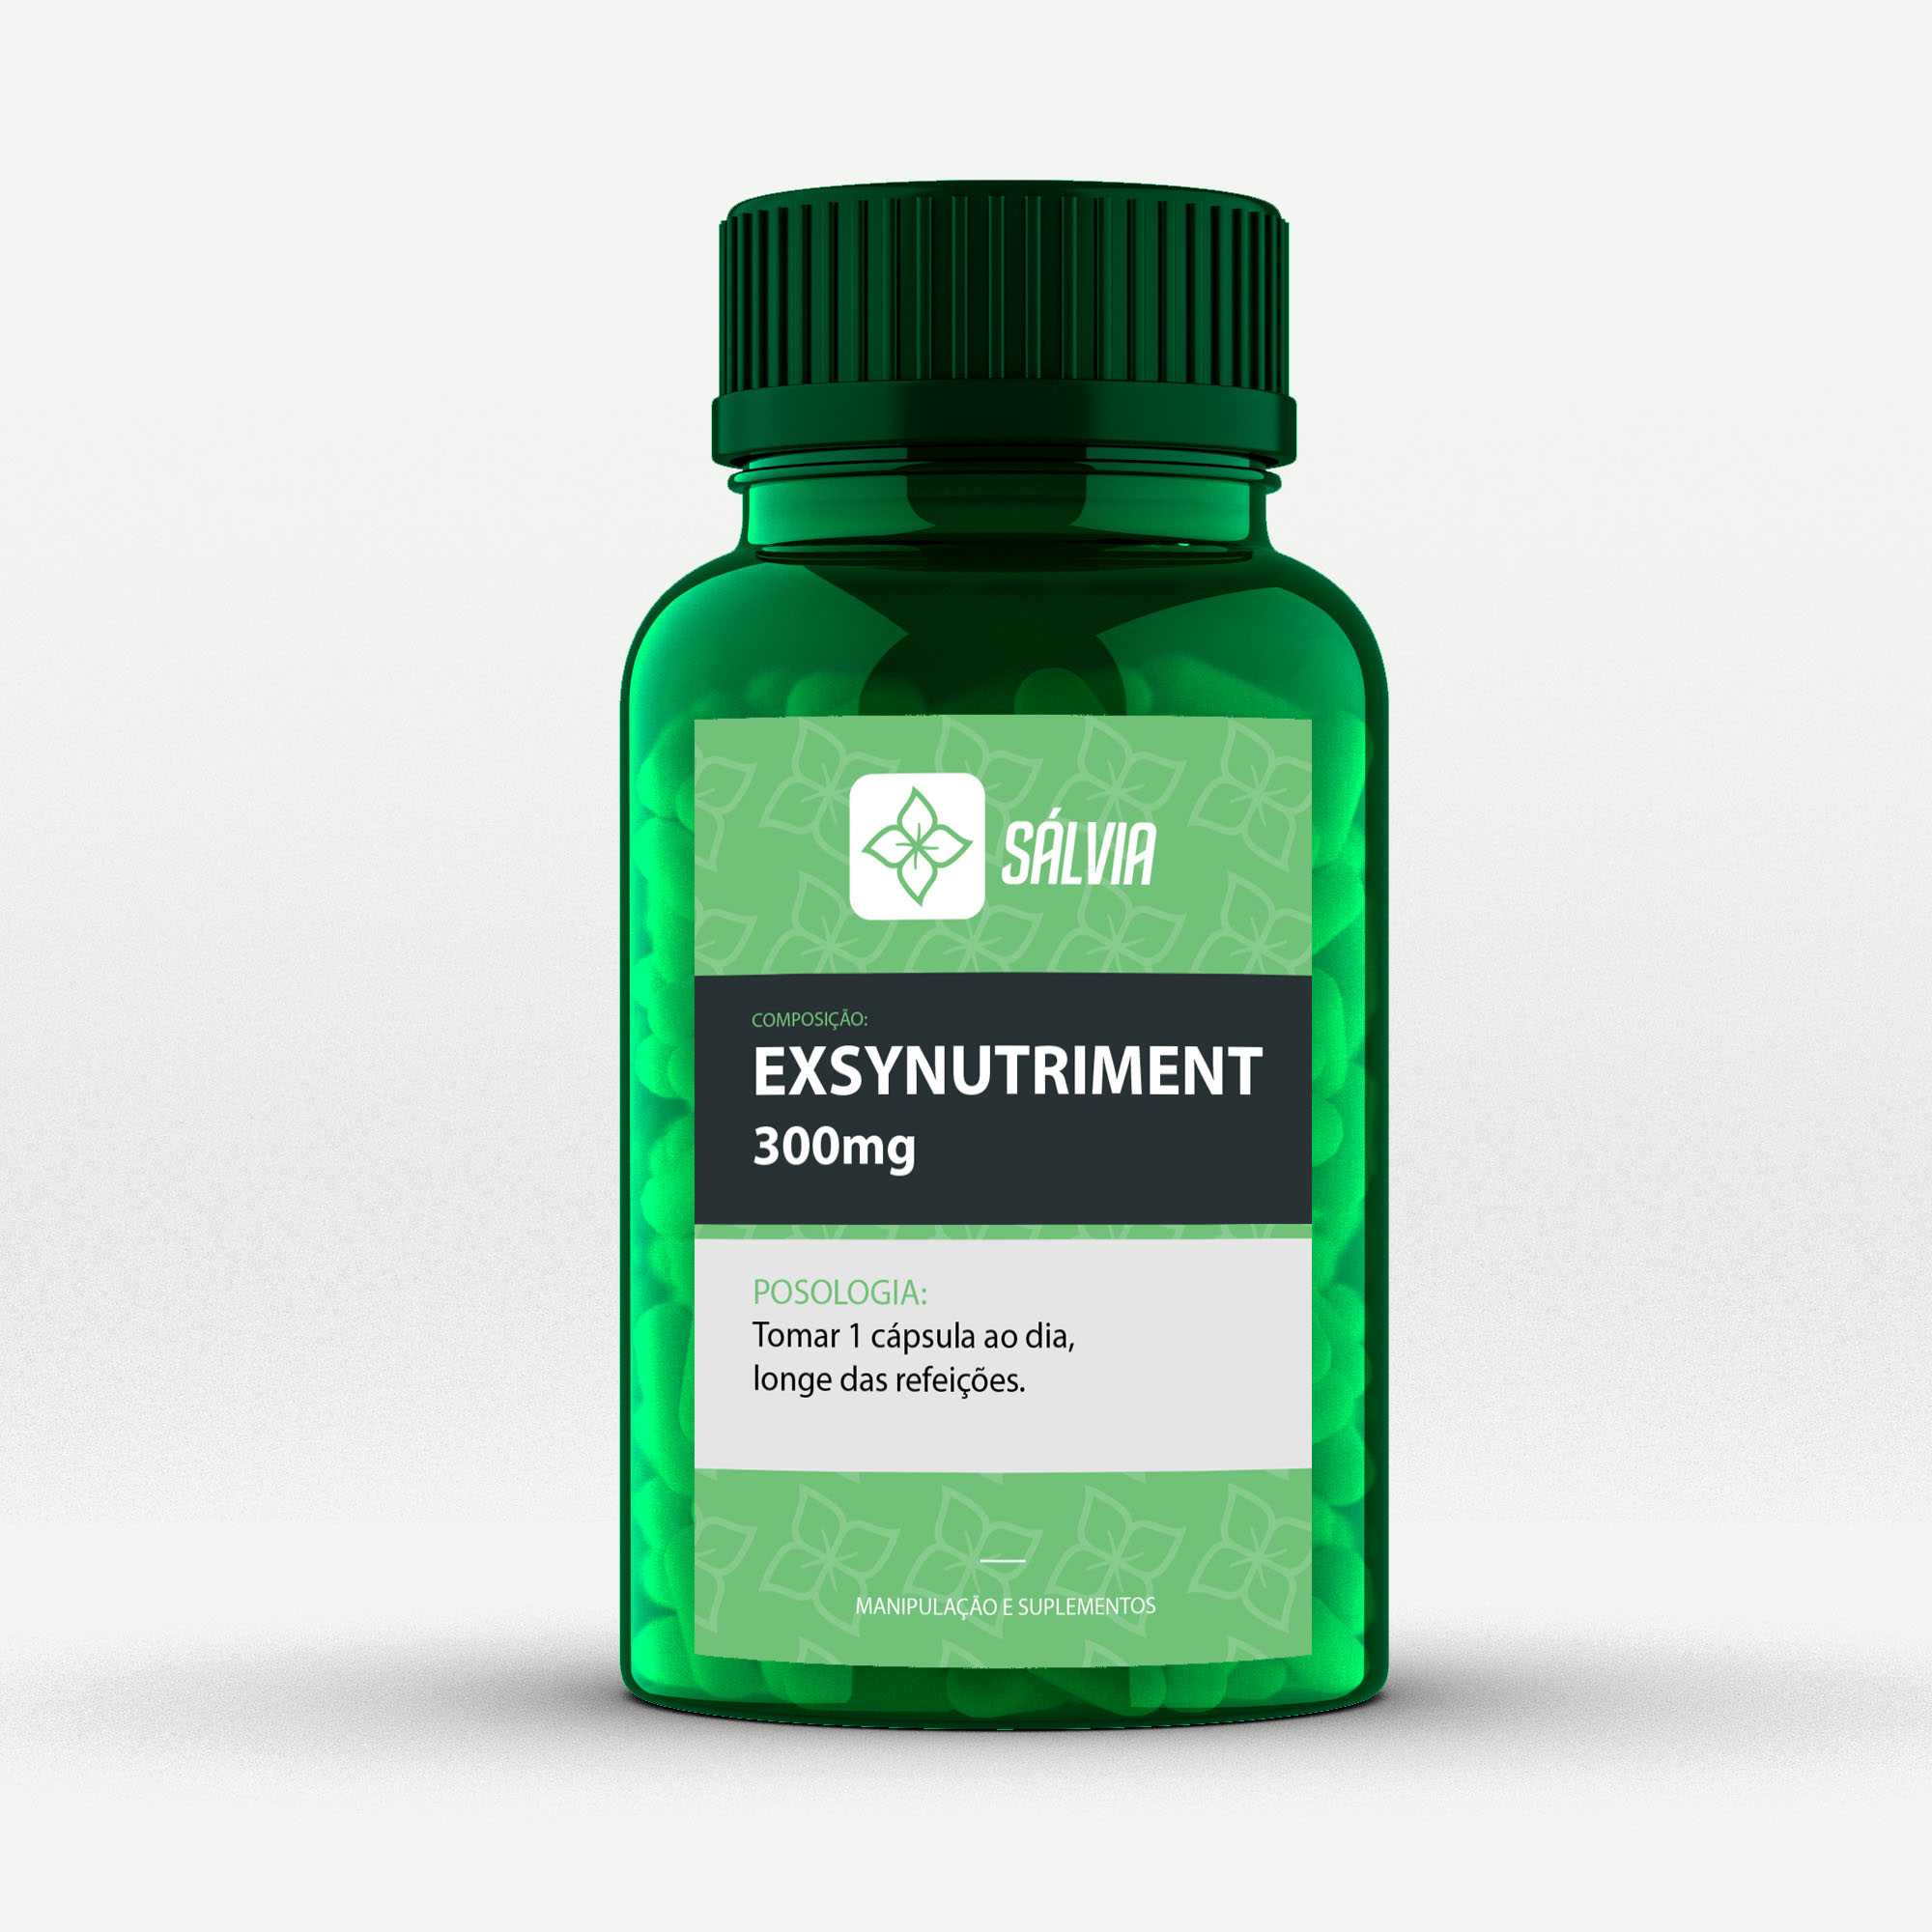 EXSYNUTRIMENT 300mg - Cápsulas